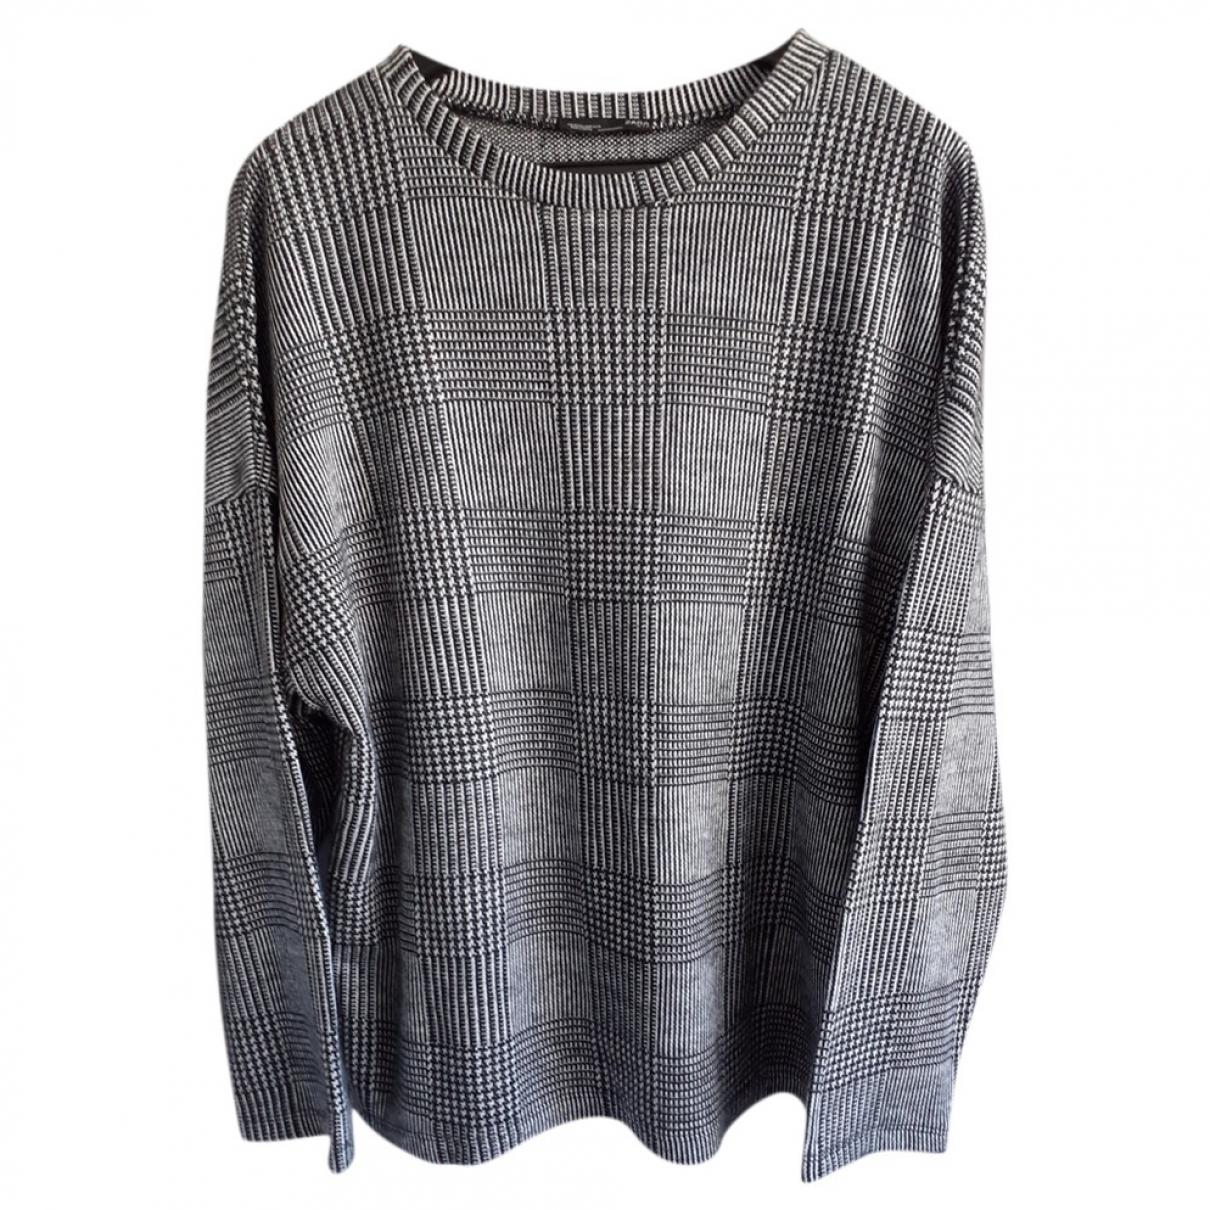 Zara \N Pullover in  Weiss Wolle